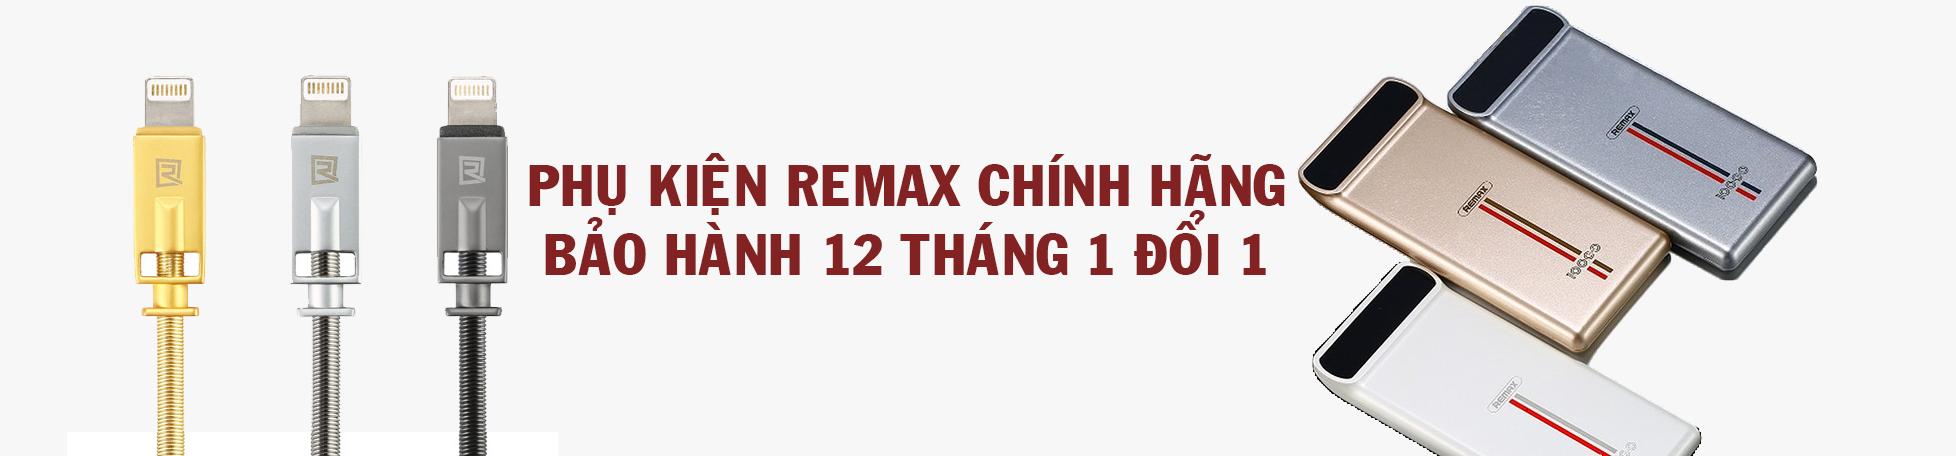 Phụ Kiện Remax